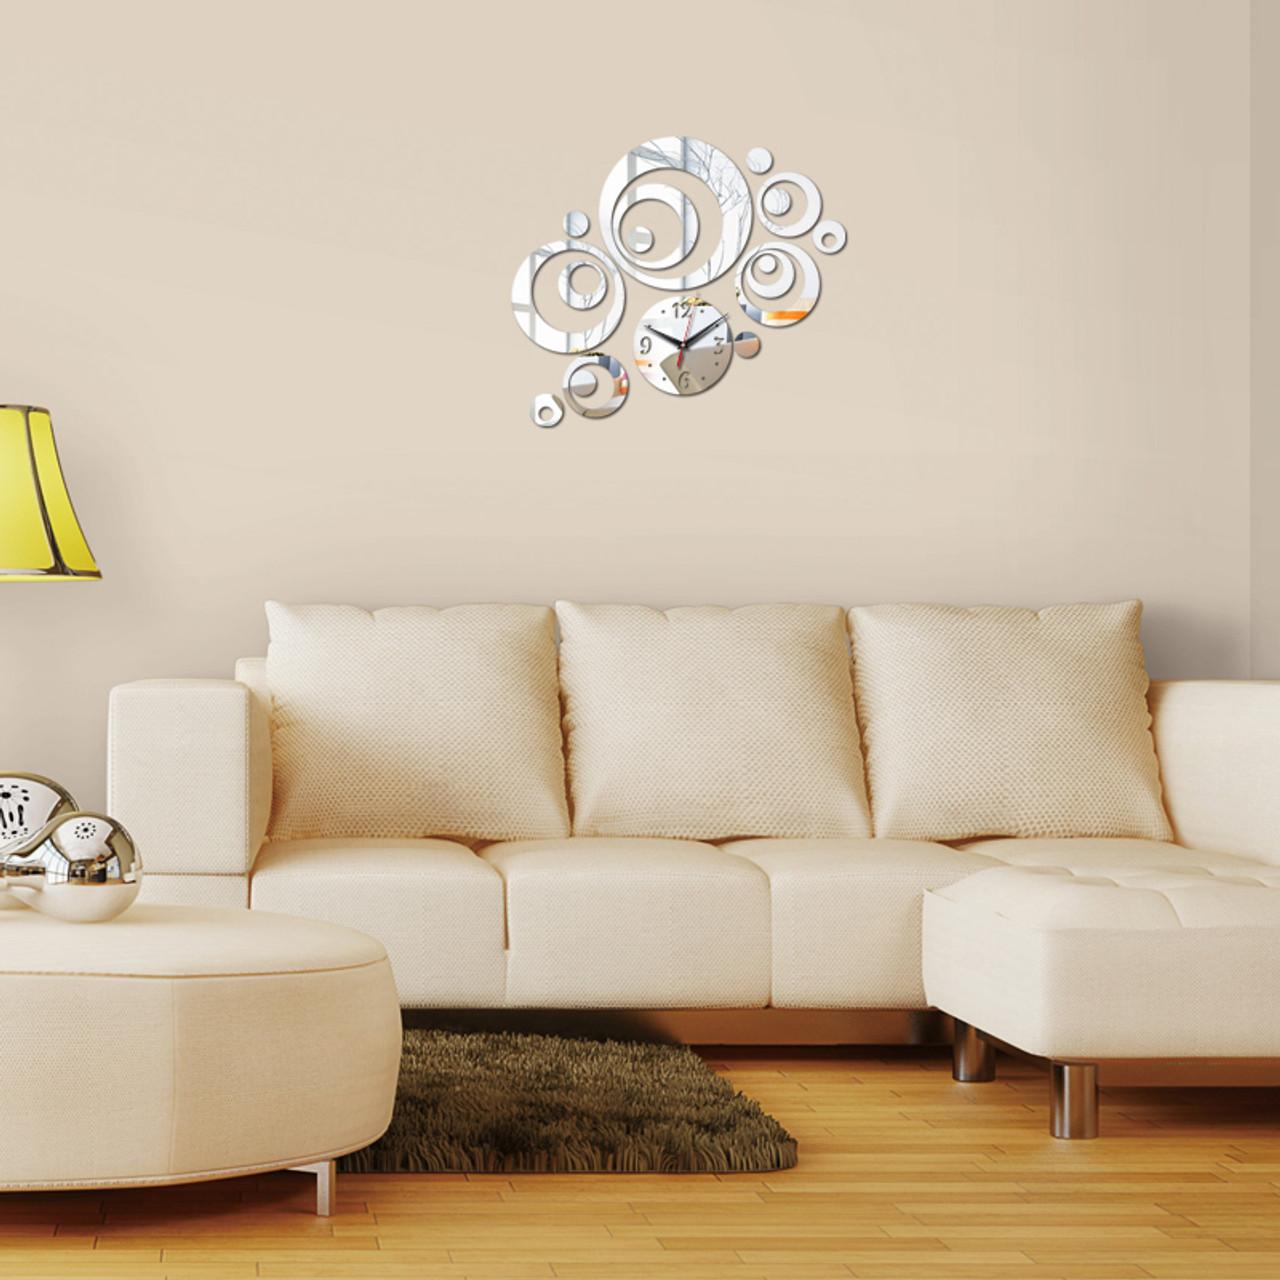 ... 2016 New Wall Clock Horloge Modern Design Reloj De Pared Large  Decorative Digital Watch Living Room ...